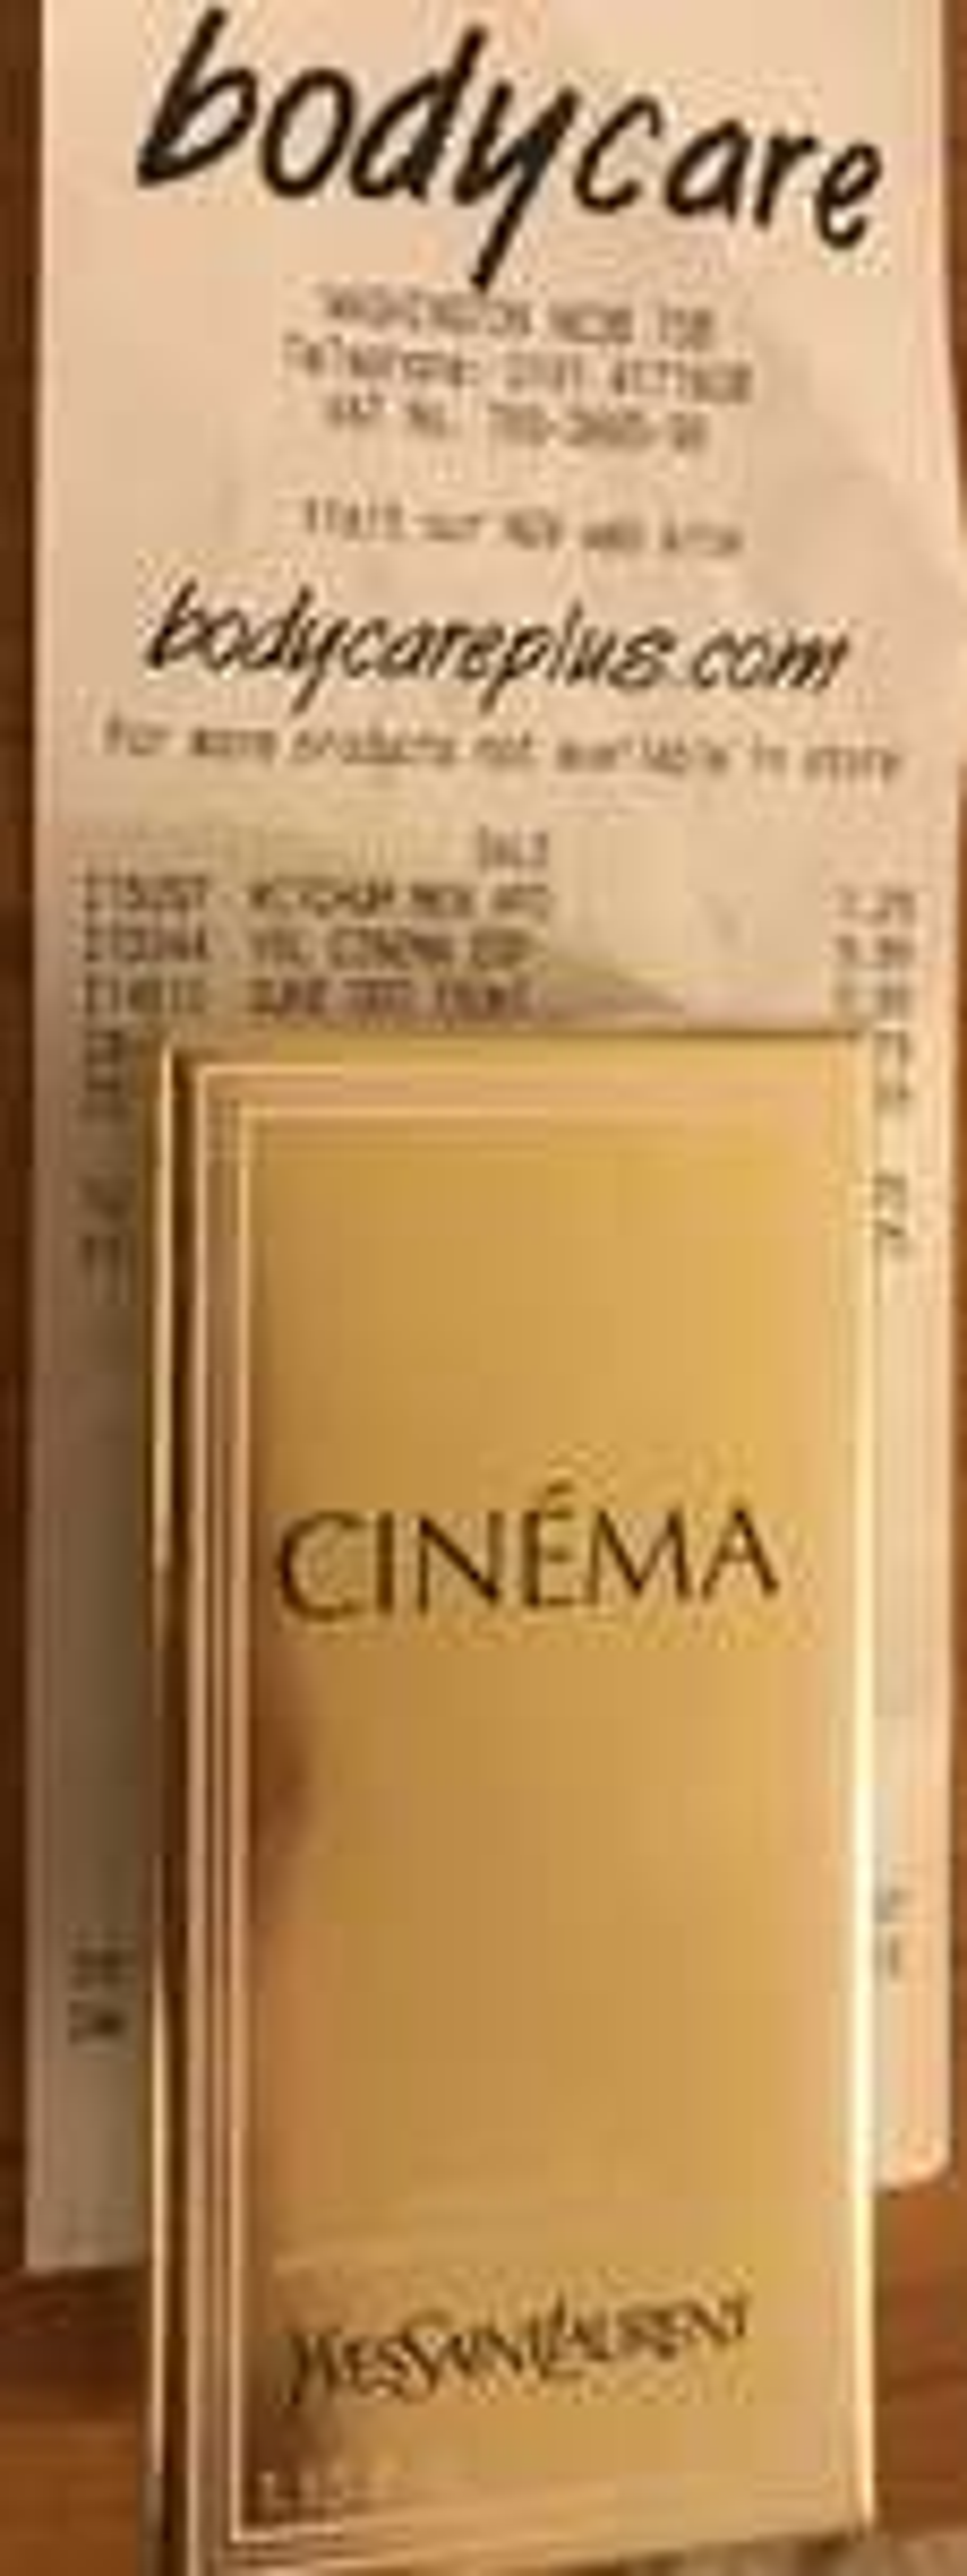 Ysl Cinema EDP 35ml only £9.99 in Bodycare Nationwide